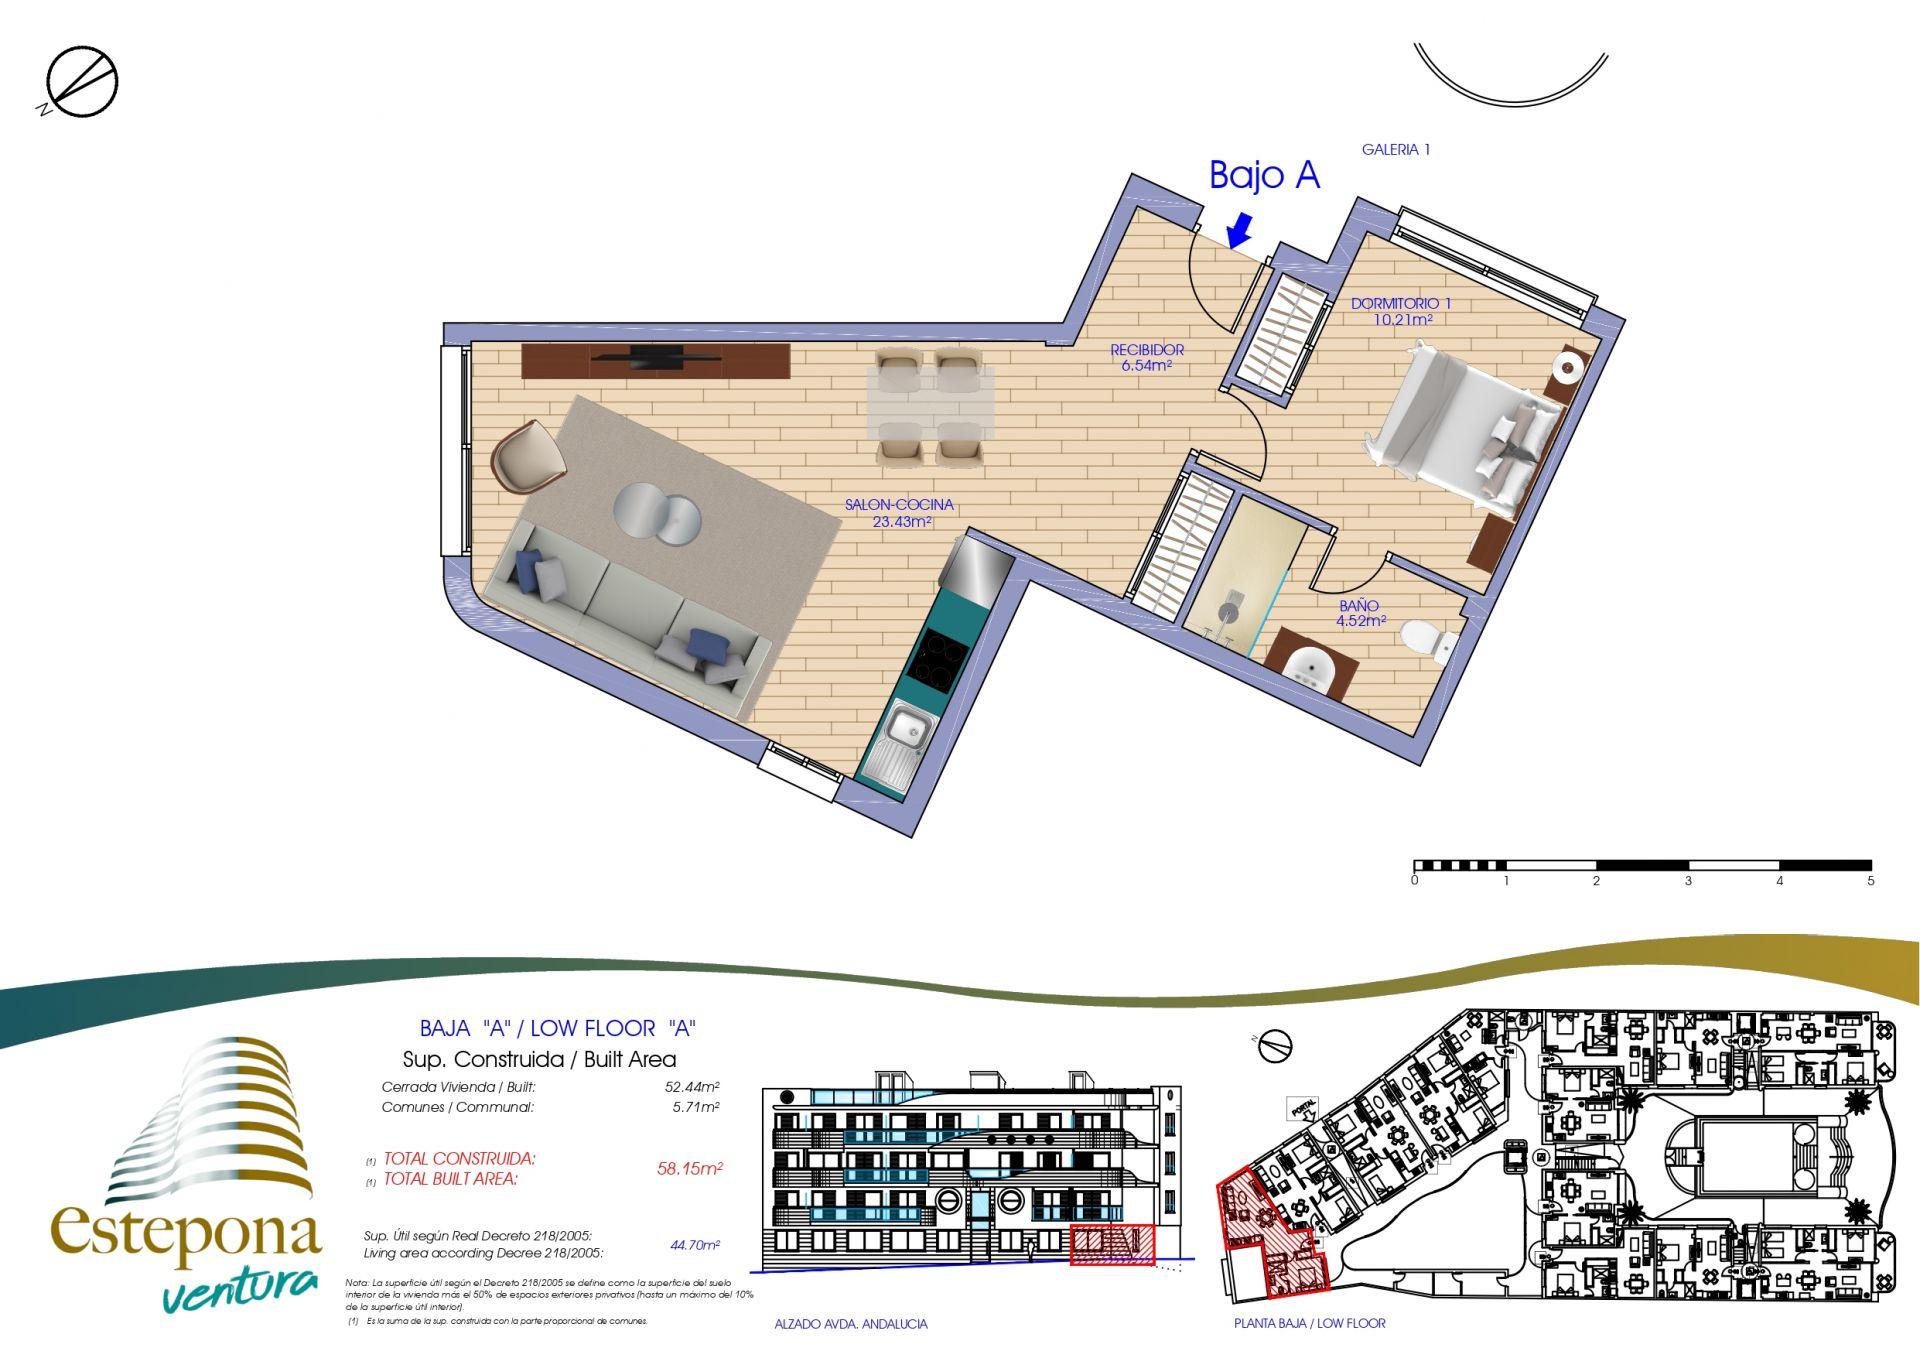 Ba - Ventura Estepona | Compra de casa en Estepona